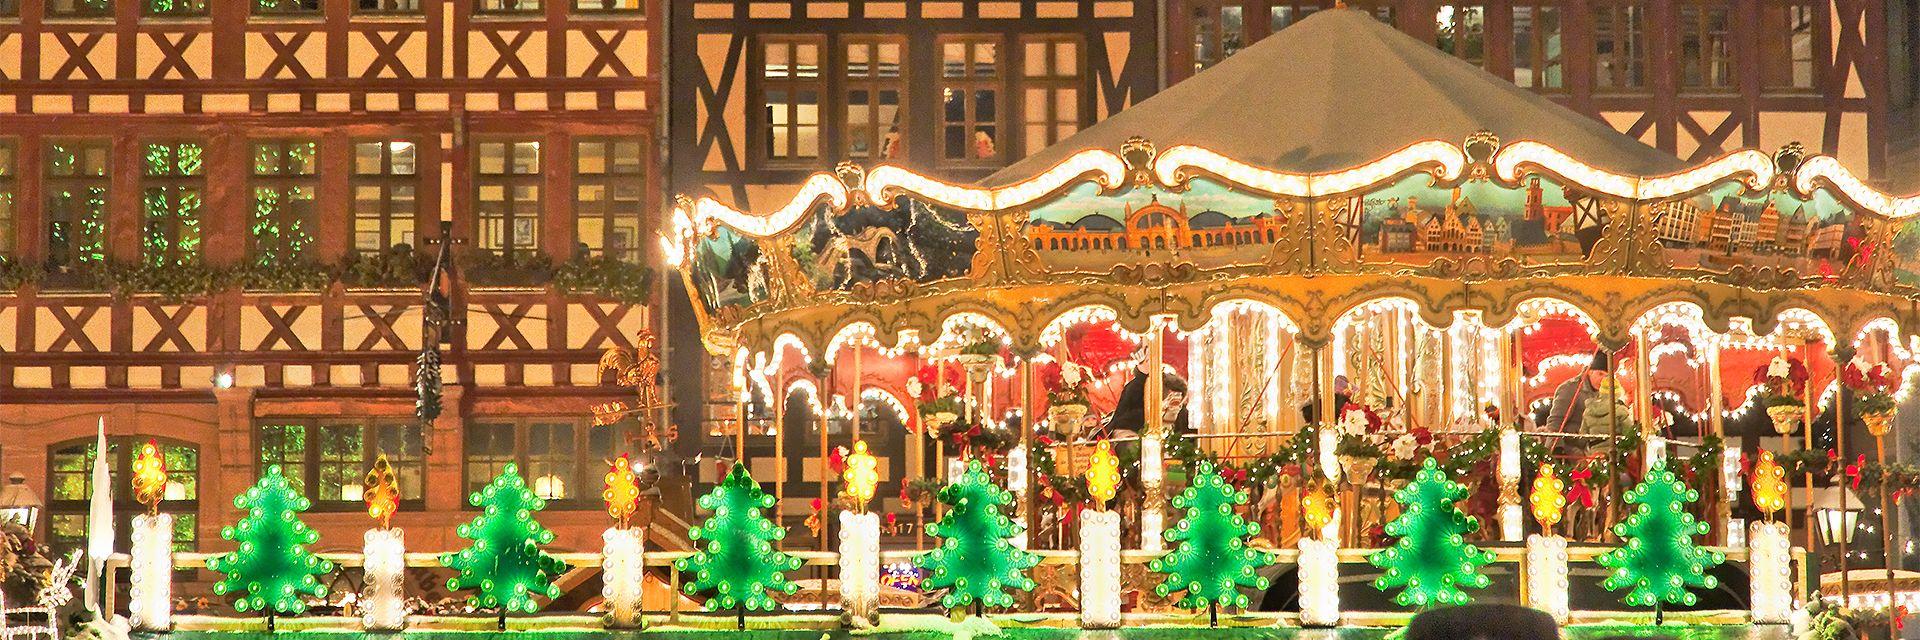 julemarked i frankfurt am main